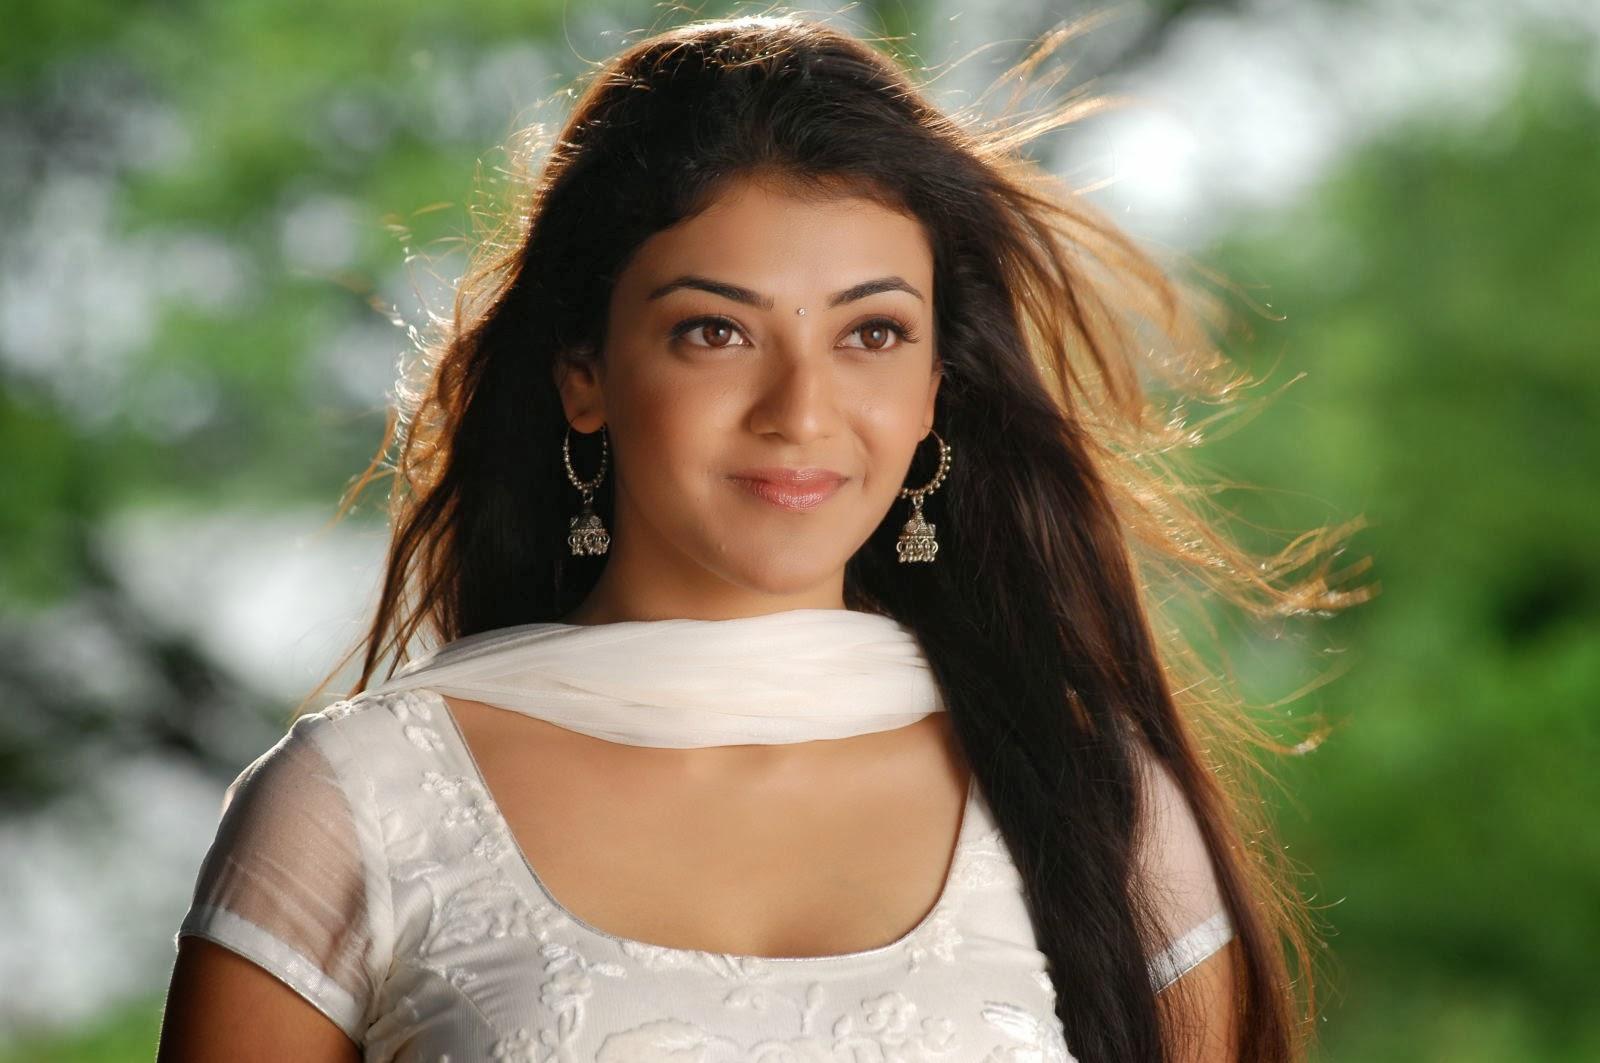 Telugu actress kajal aggarwal hd wallpapers and news everything 4u - Telugu hd wallpaper ...